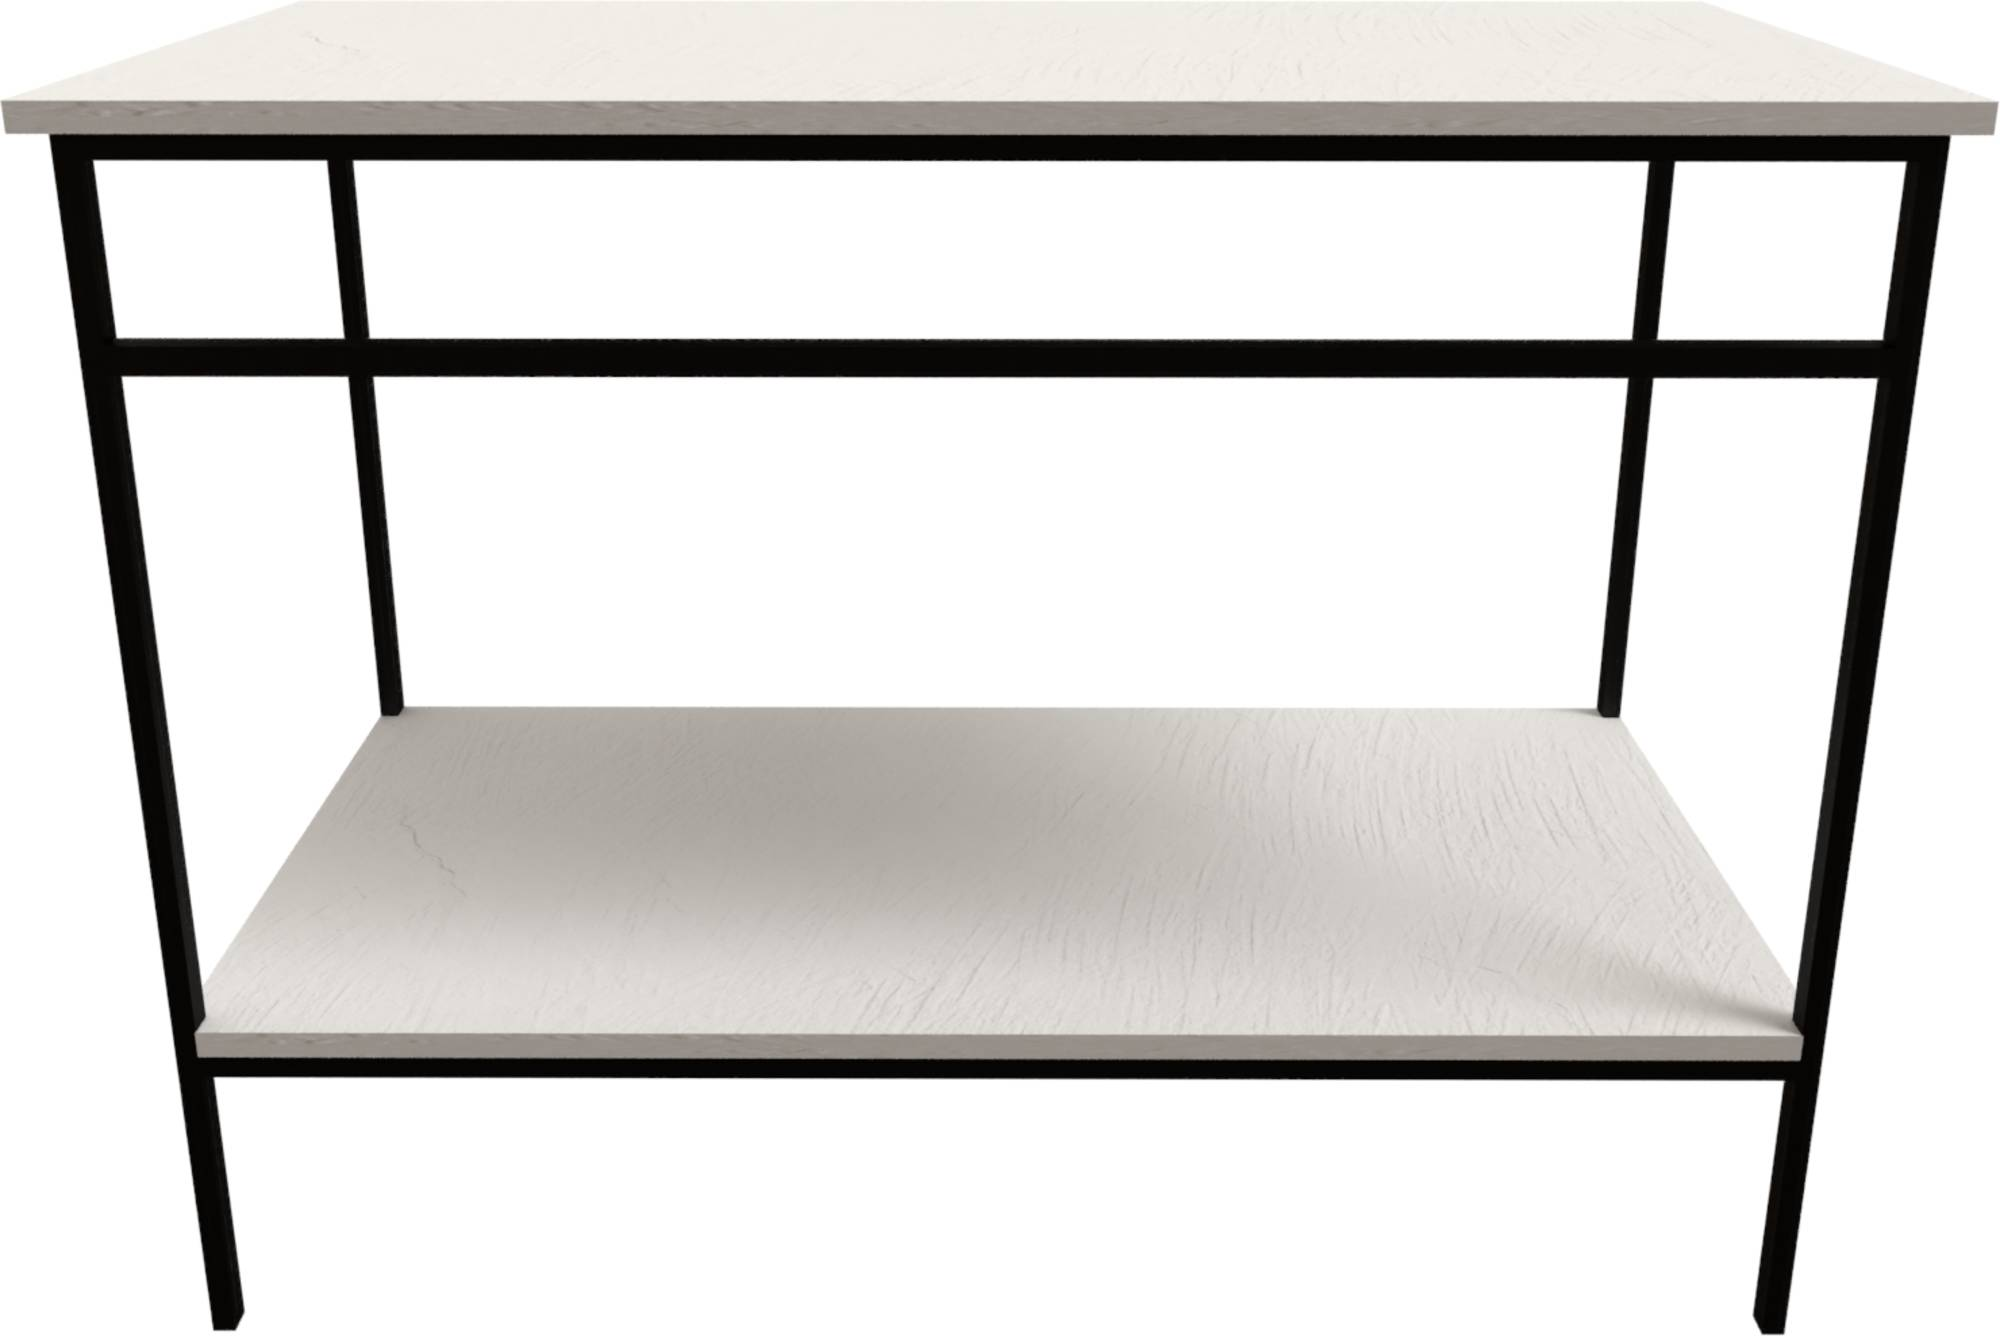 Ben Avira Set Staand Frame met Blad 80,3x46,5x85 cm Mat Zwart/Glans Wit